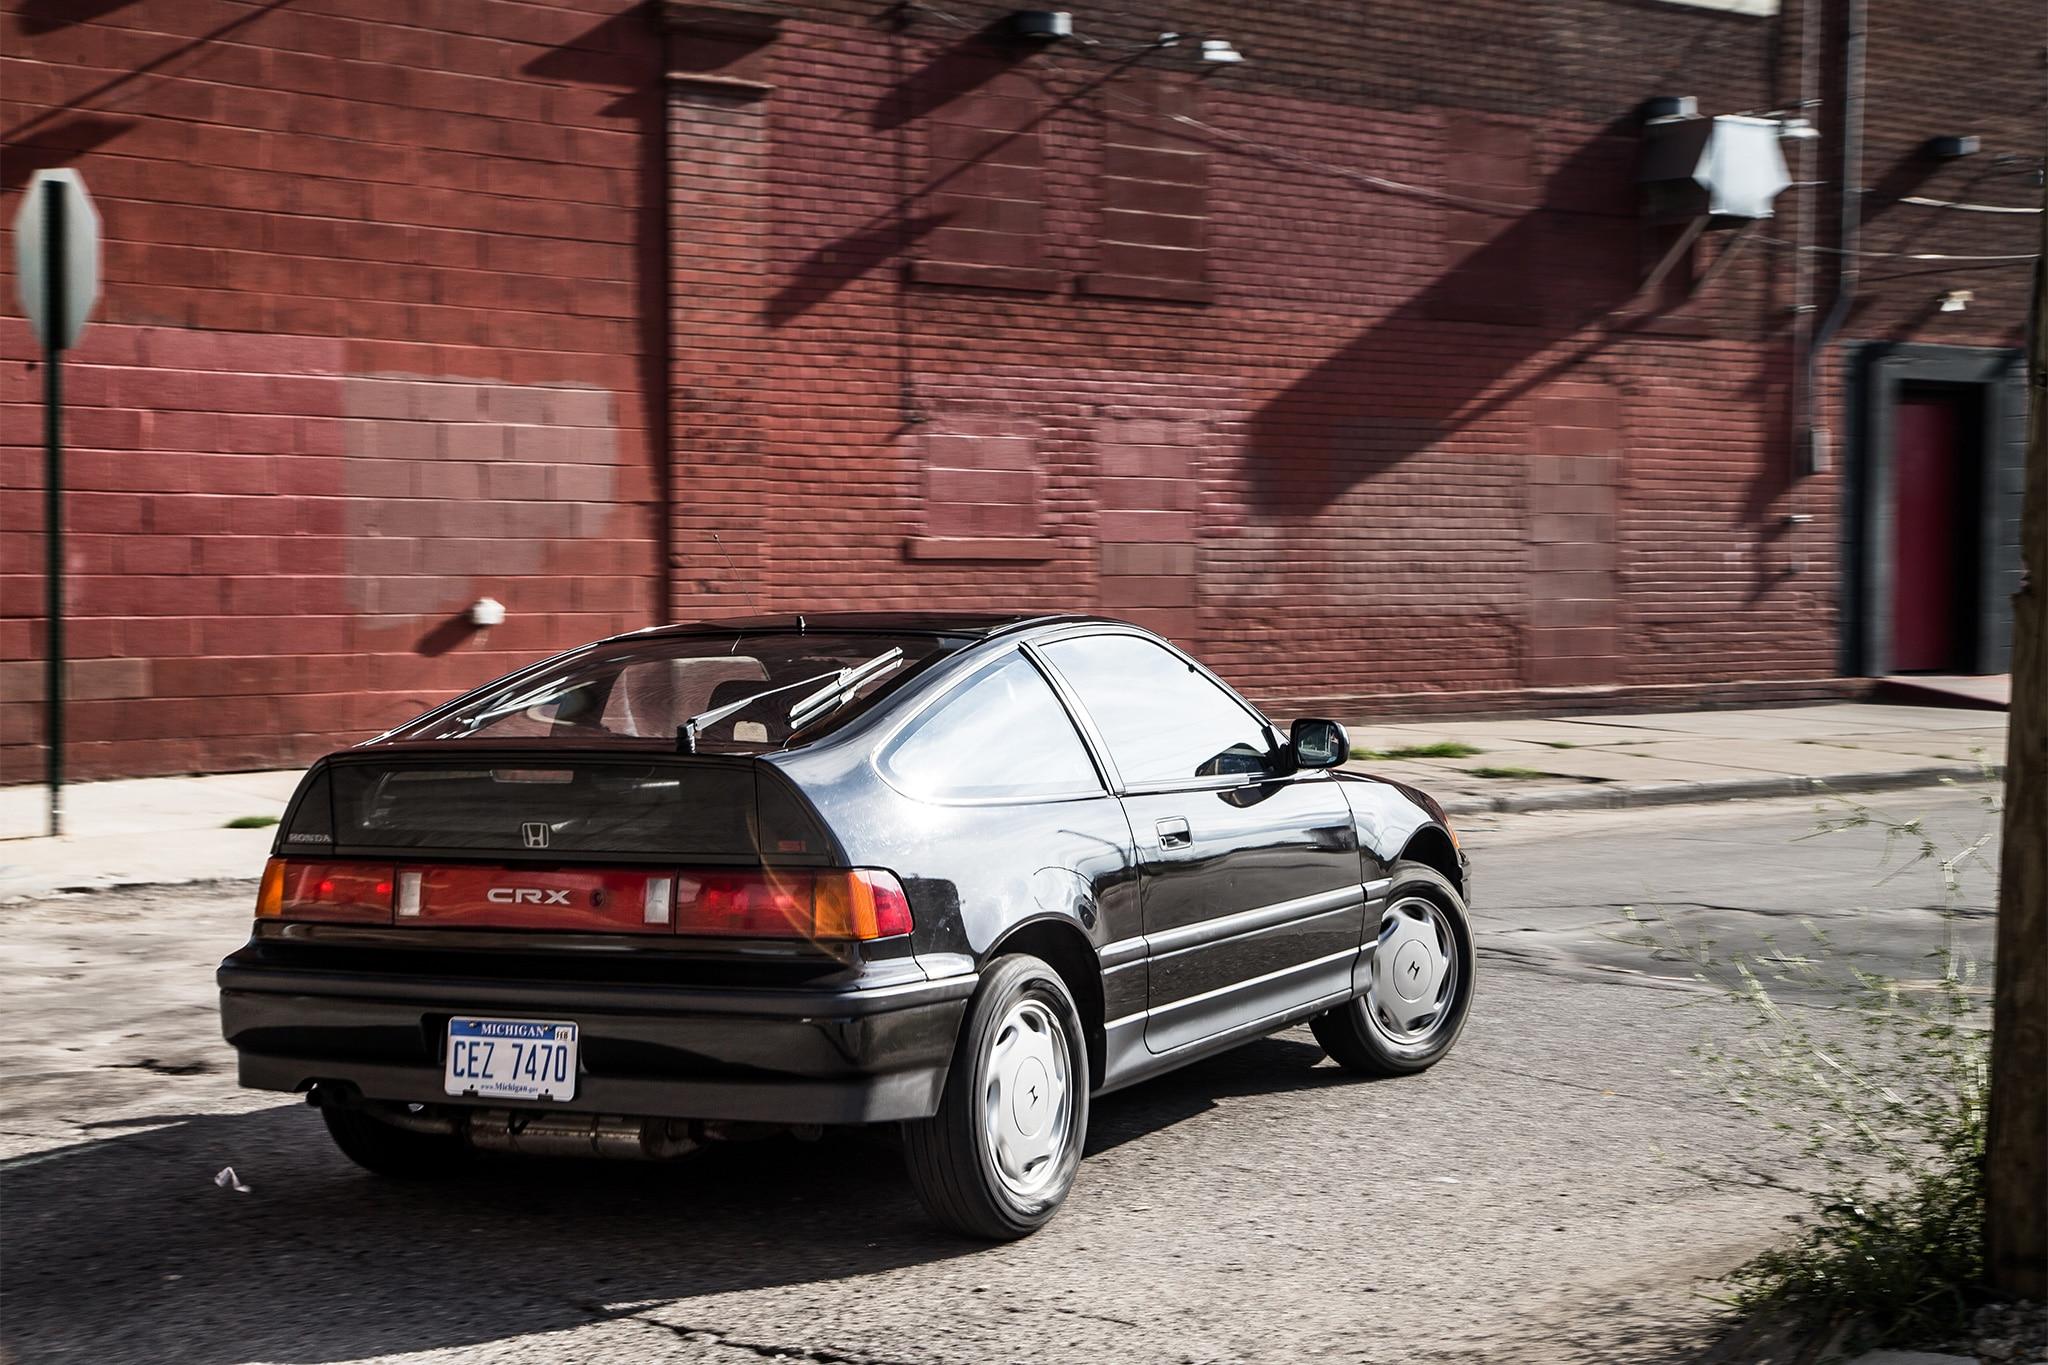 1988 1991 Honda Crx Si Collectible Classic Automobile